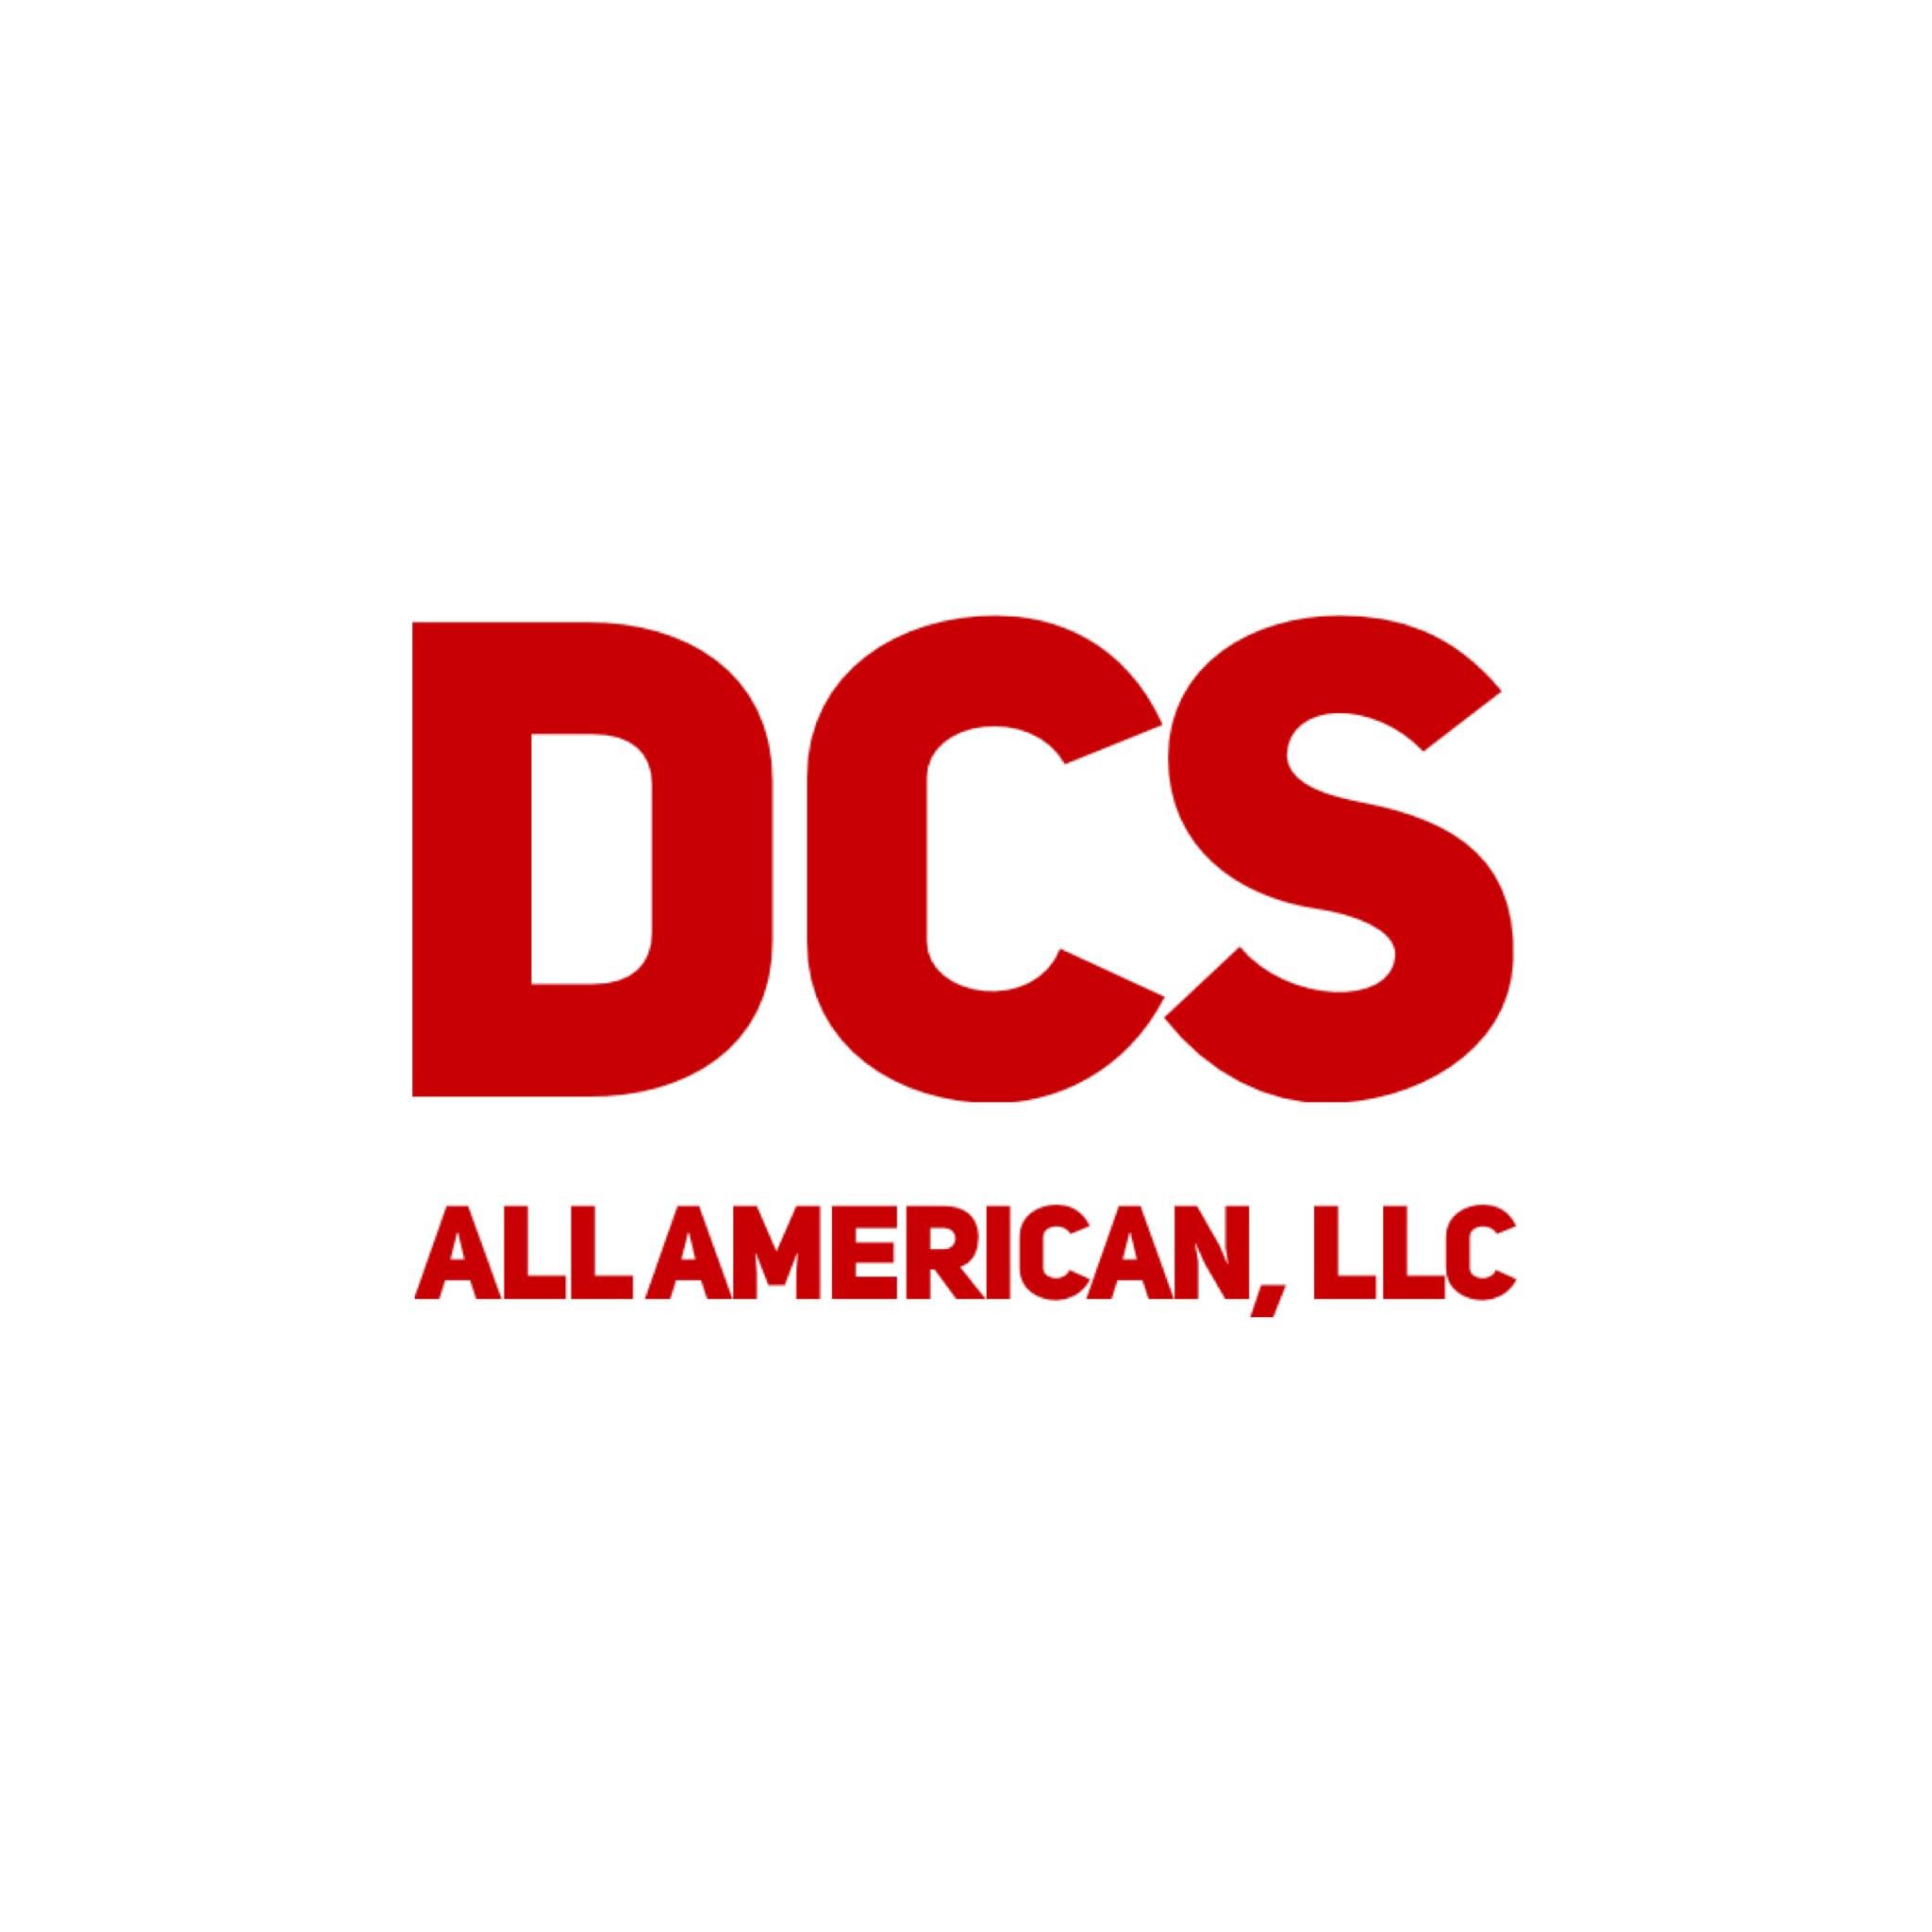 DCS All American, LLC